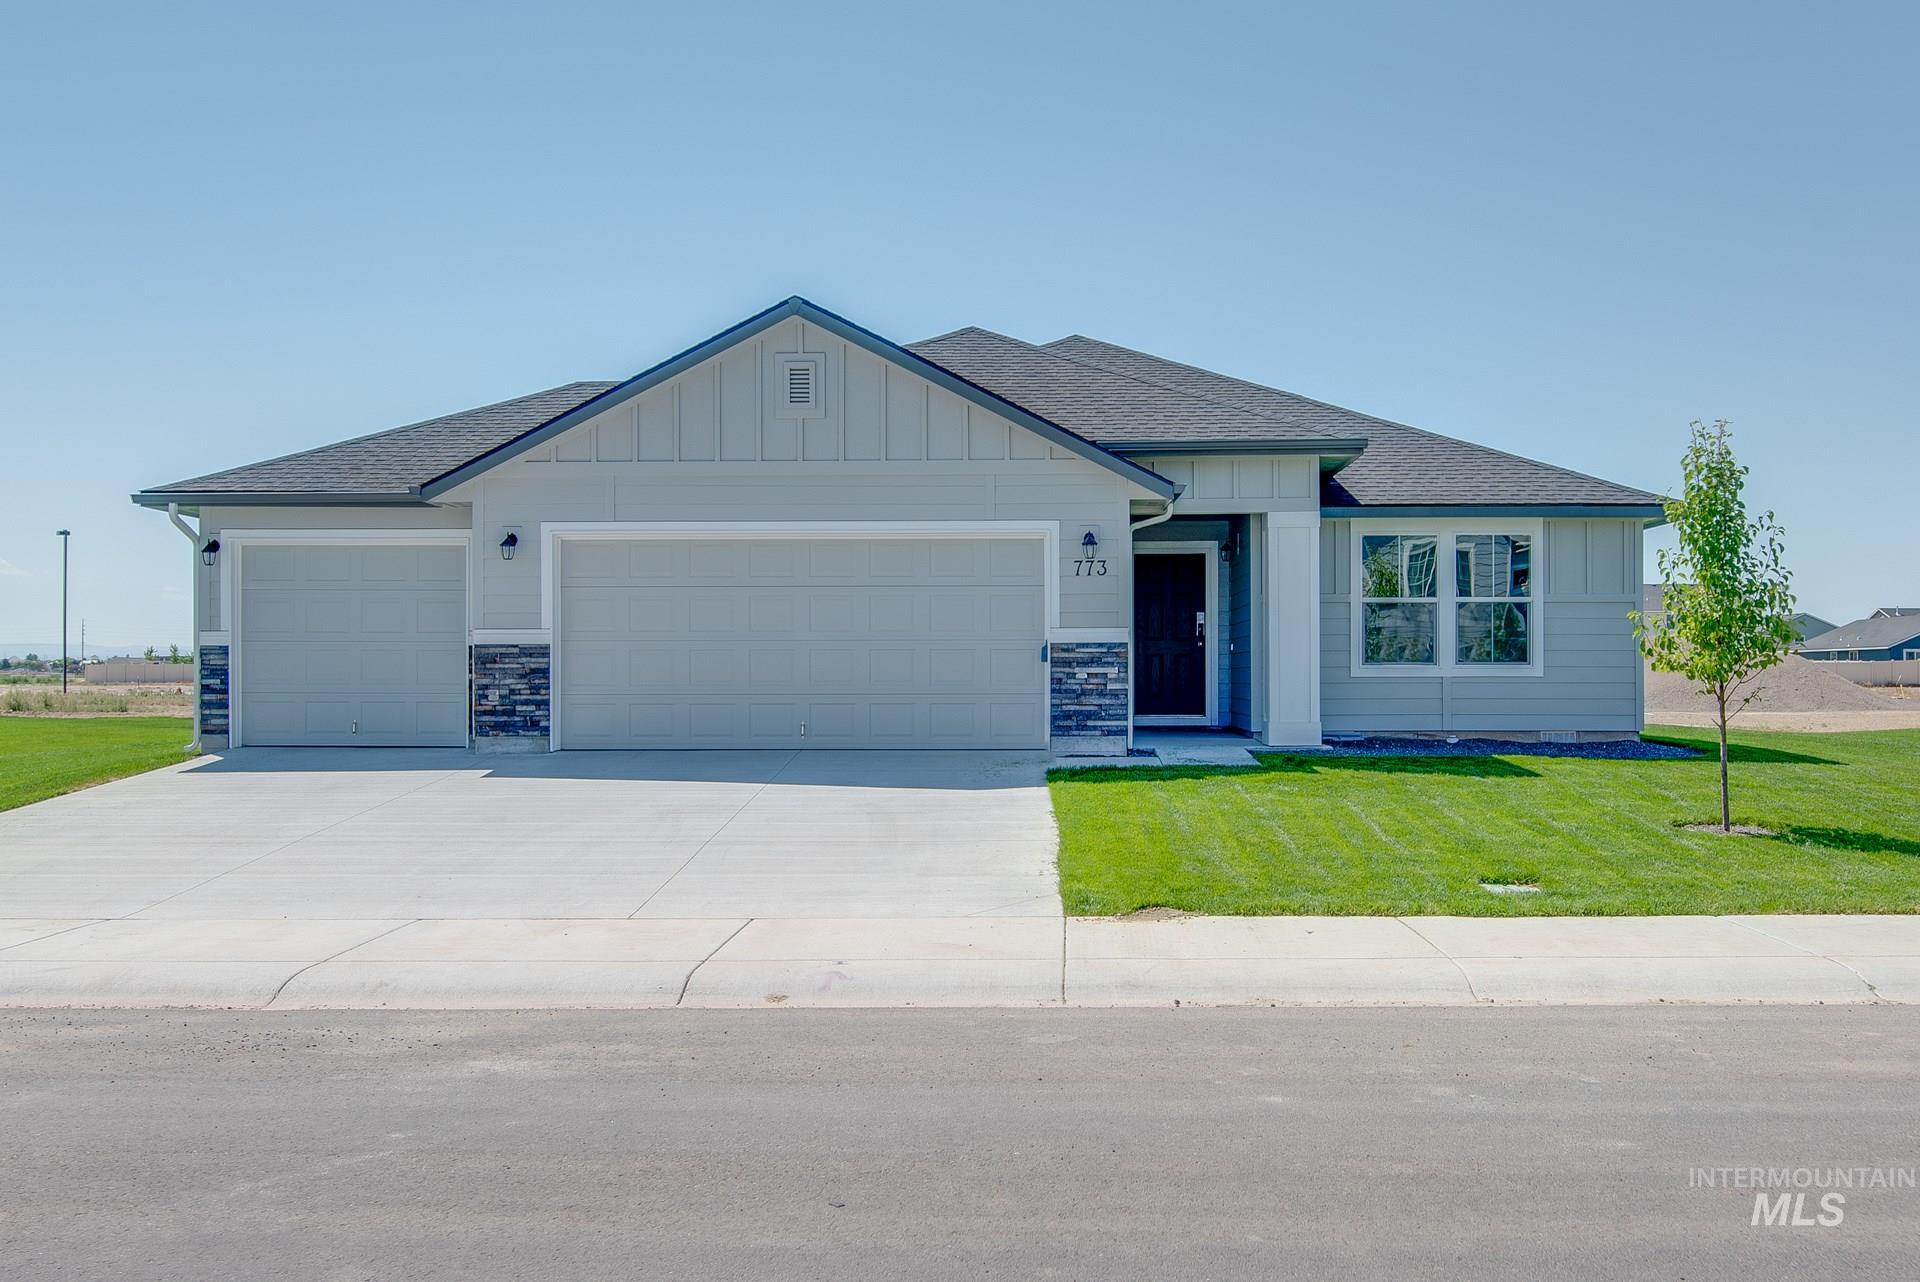 11204 W Mureau River St Property Photo - Nampa, ID real estate listing